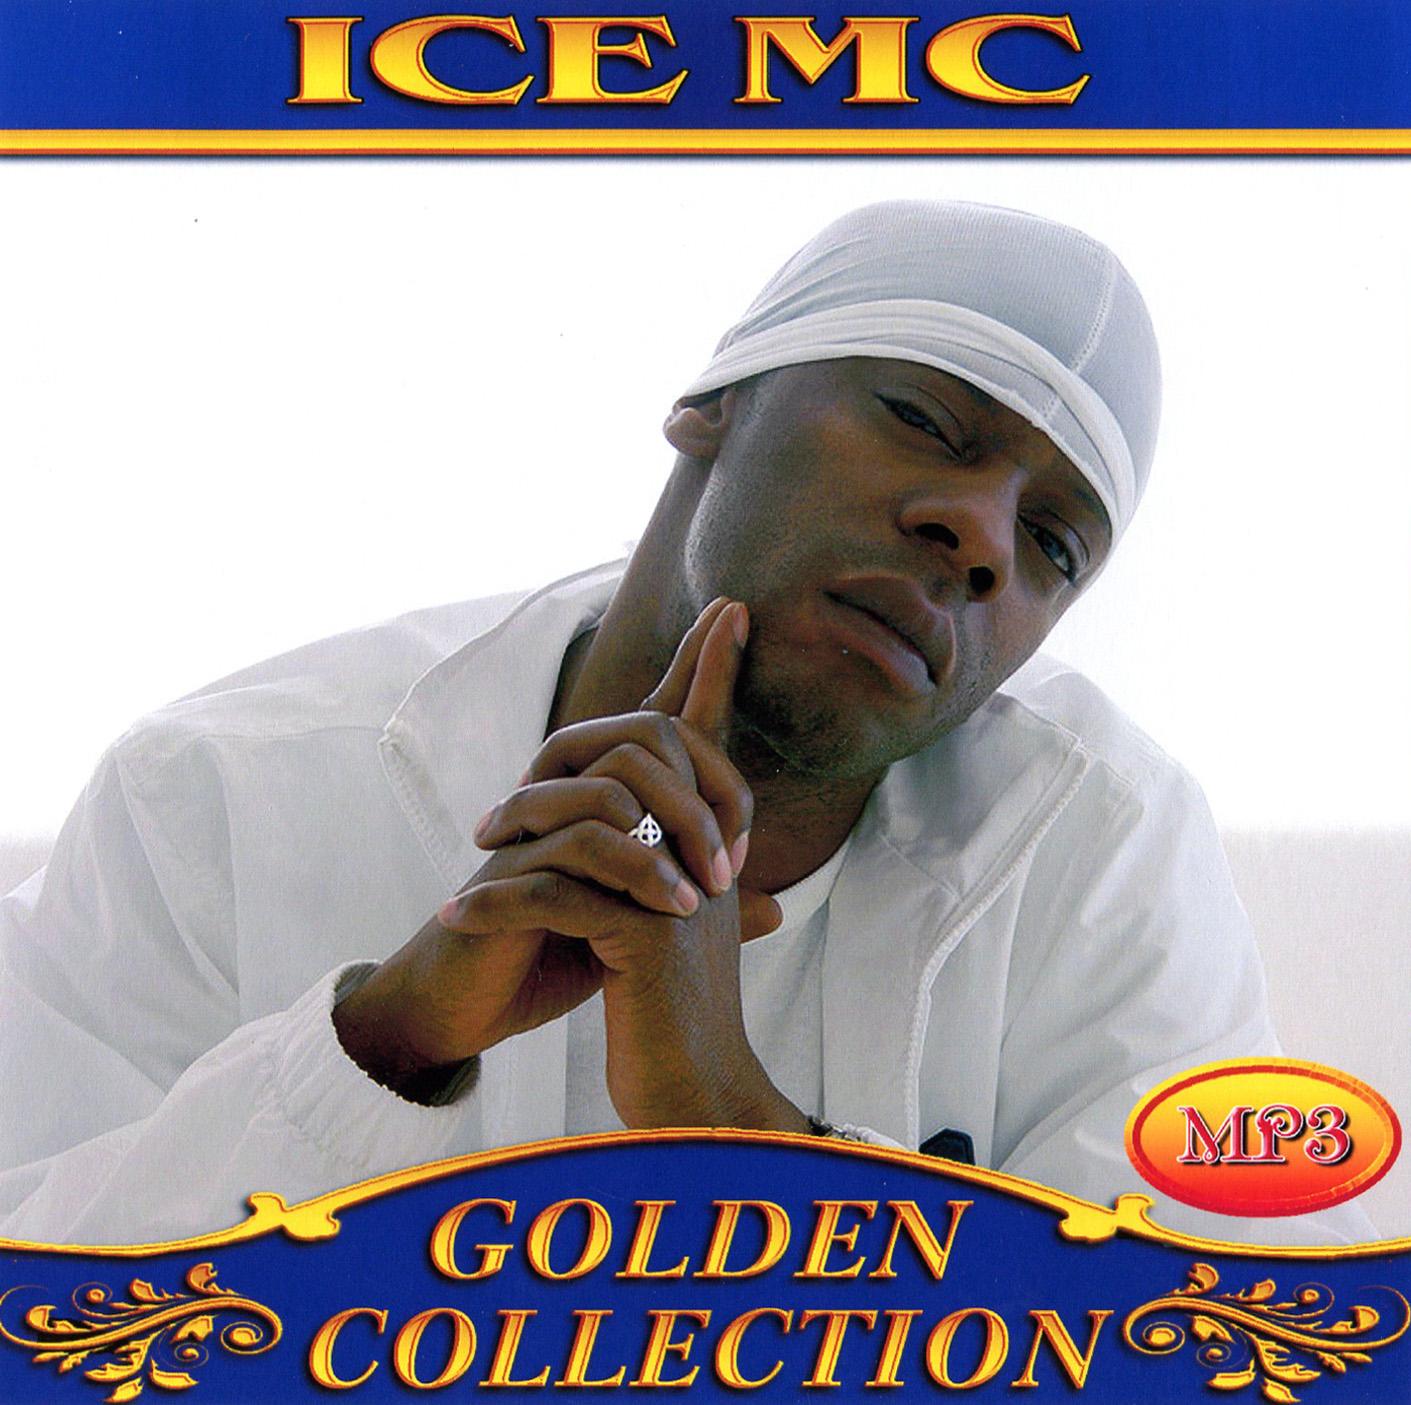 Ice Mc [mp3]